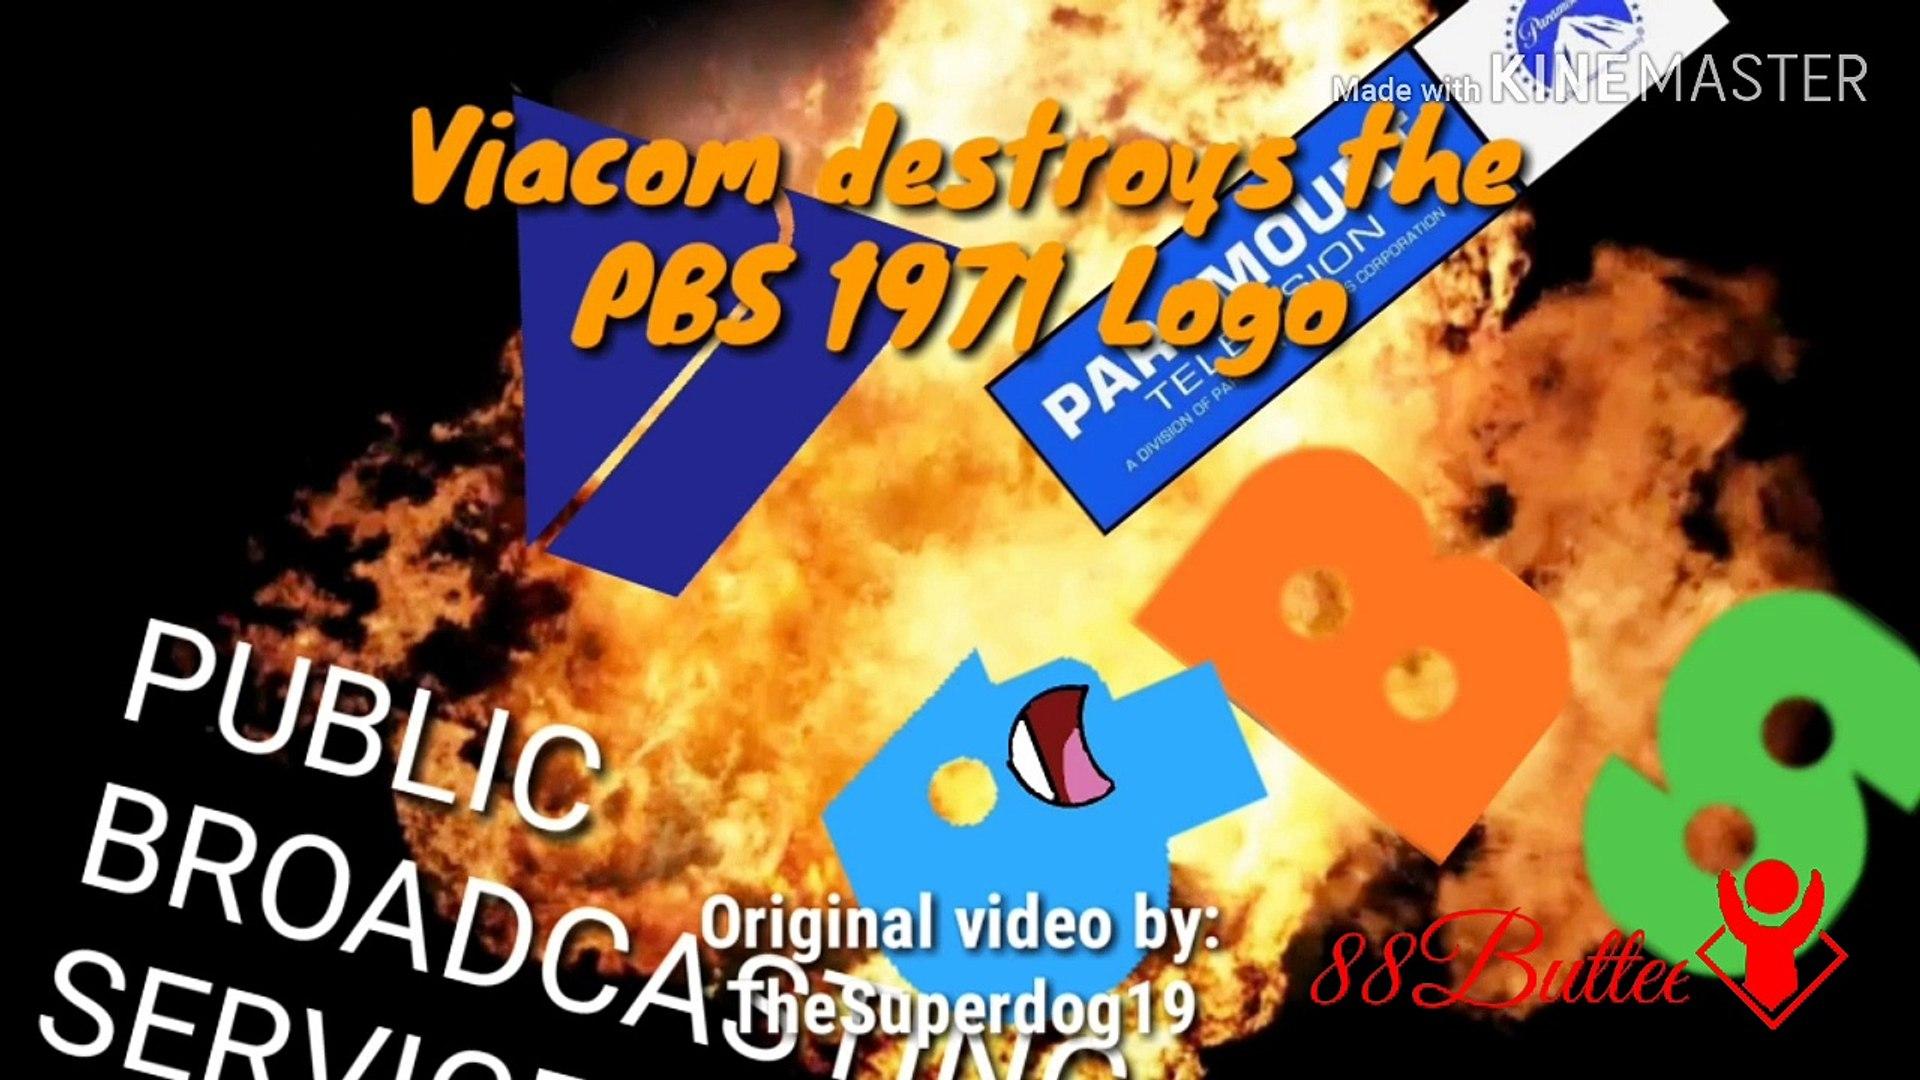 PBS Parodies Fun - Viacom Destroys PBS 1971 Logo